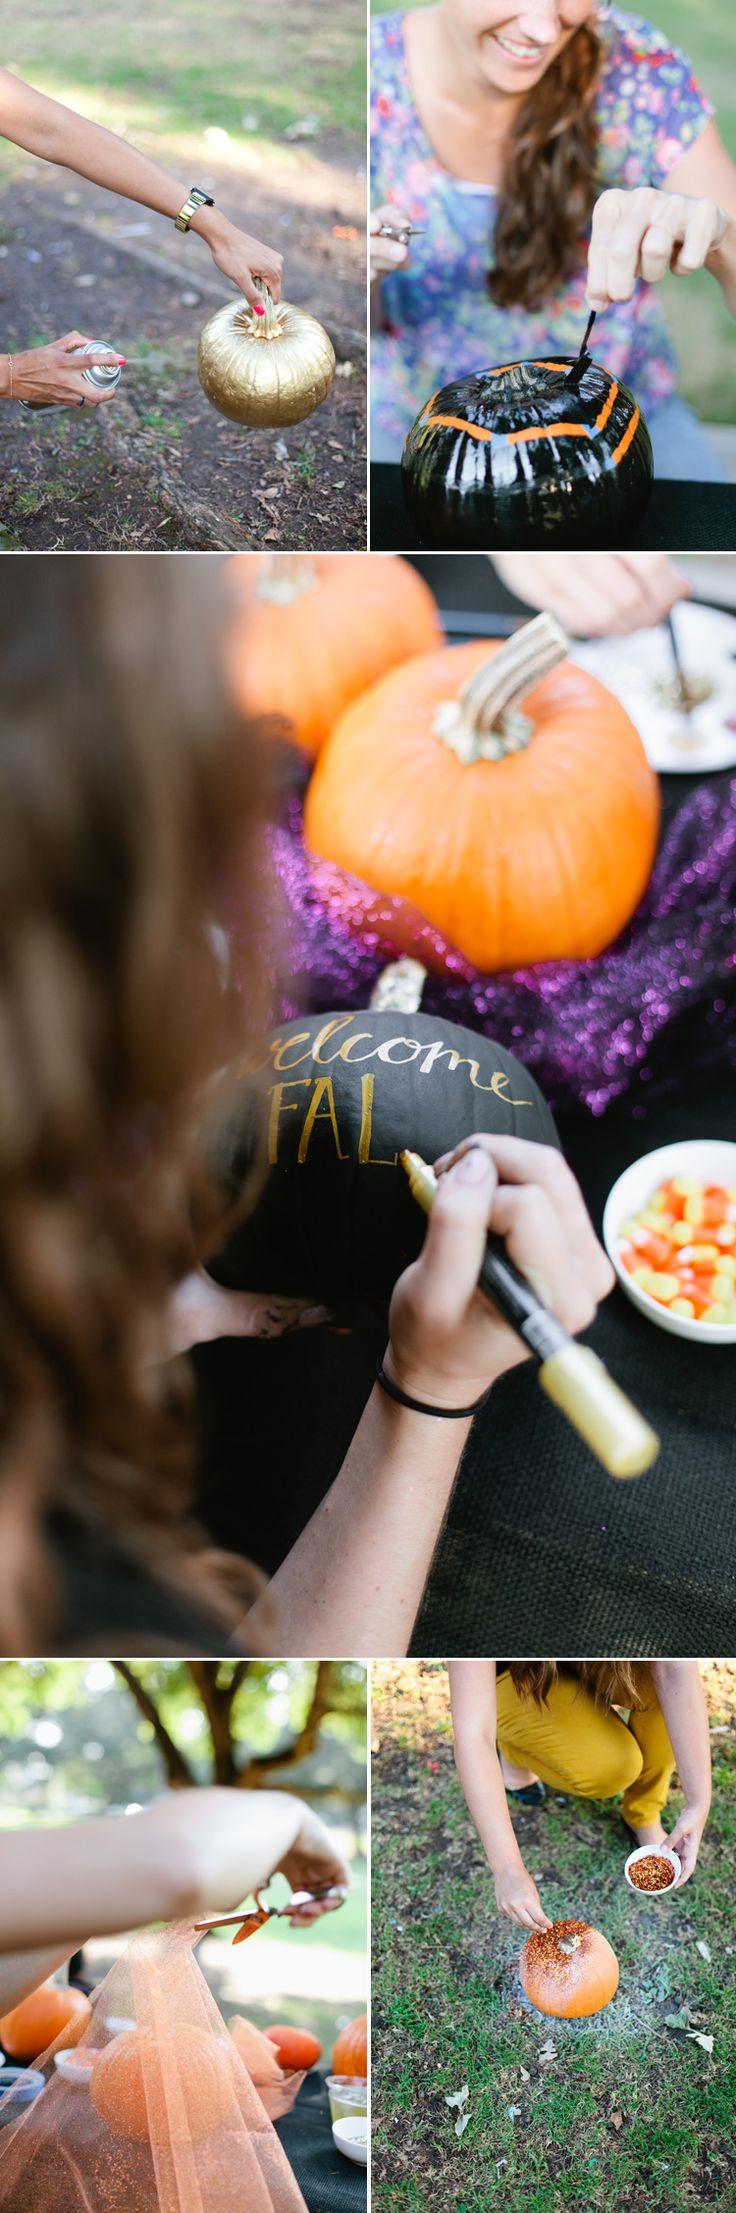 5 No-Carve Pumpkin Decorating Ideas